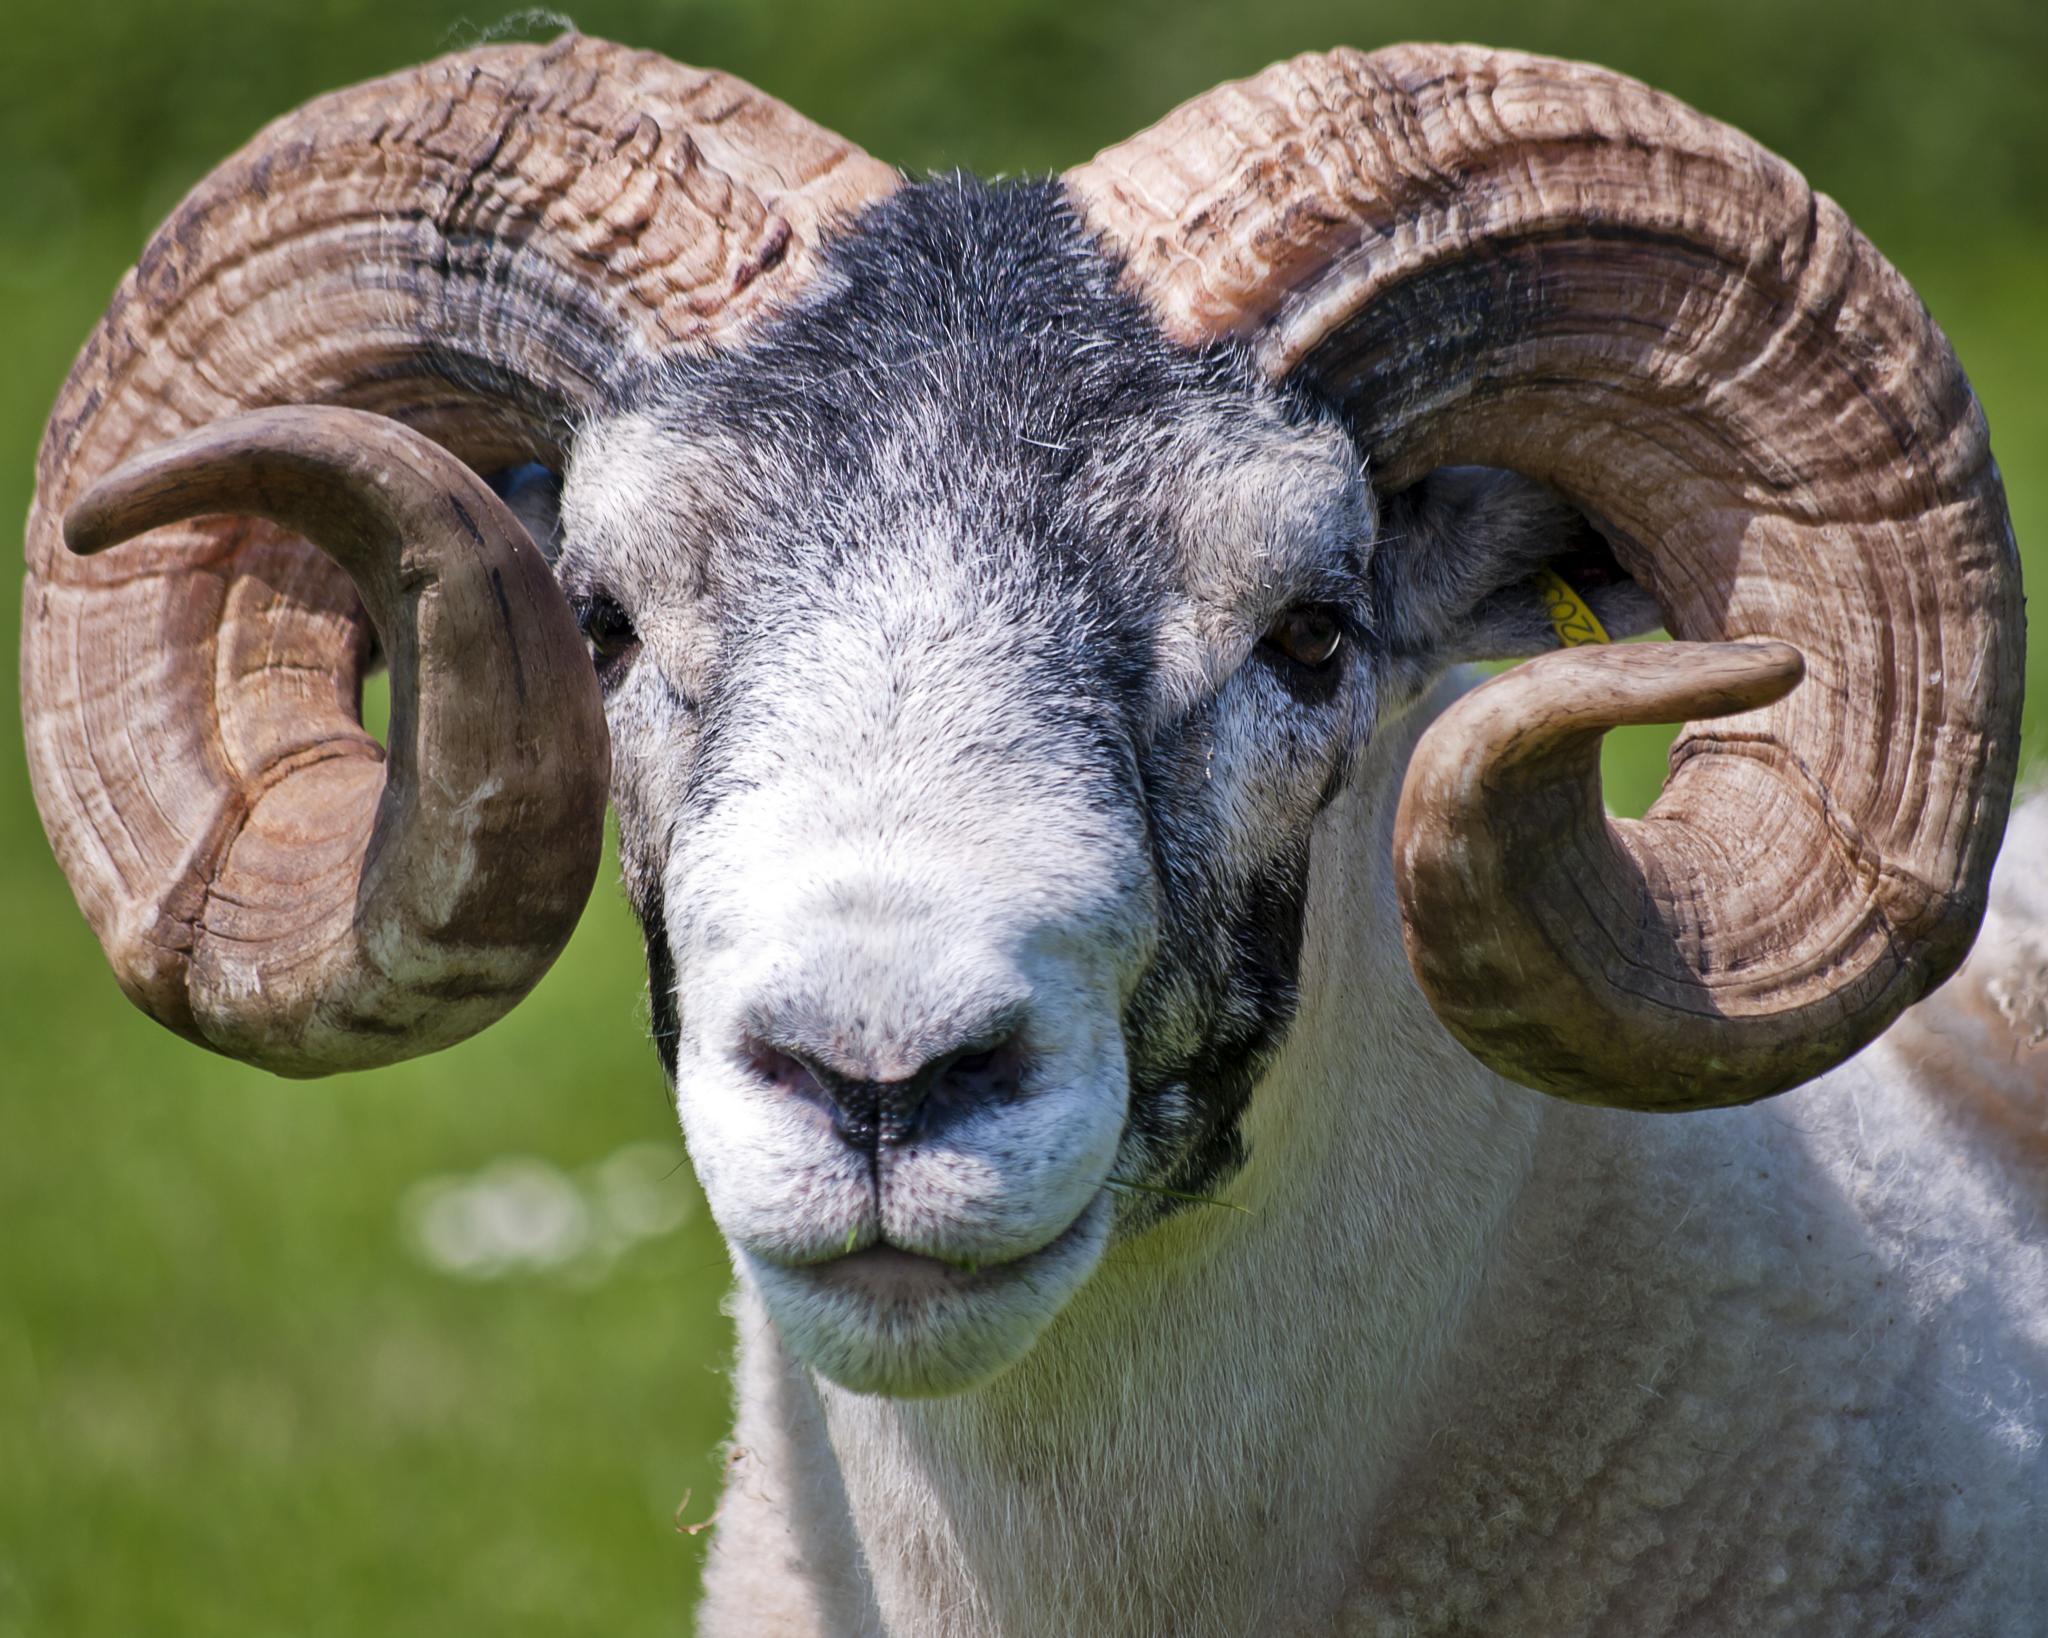 Goat by Hailceaser